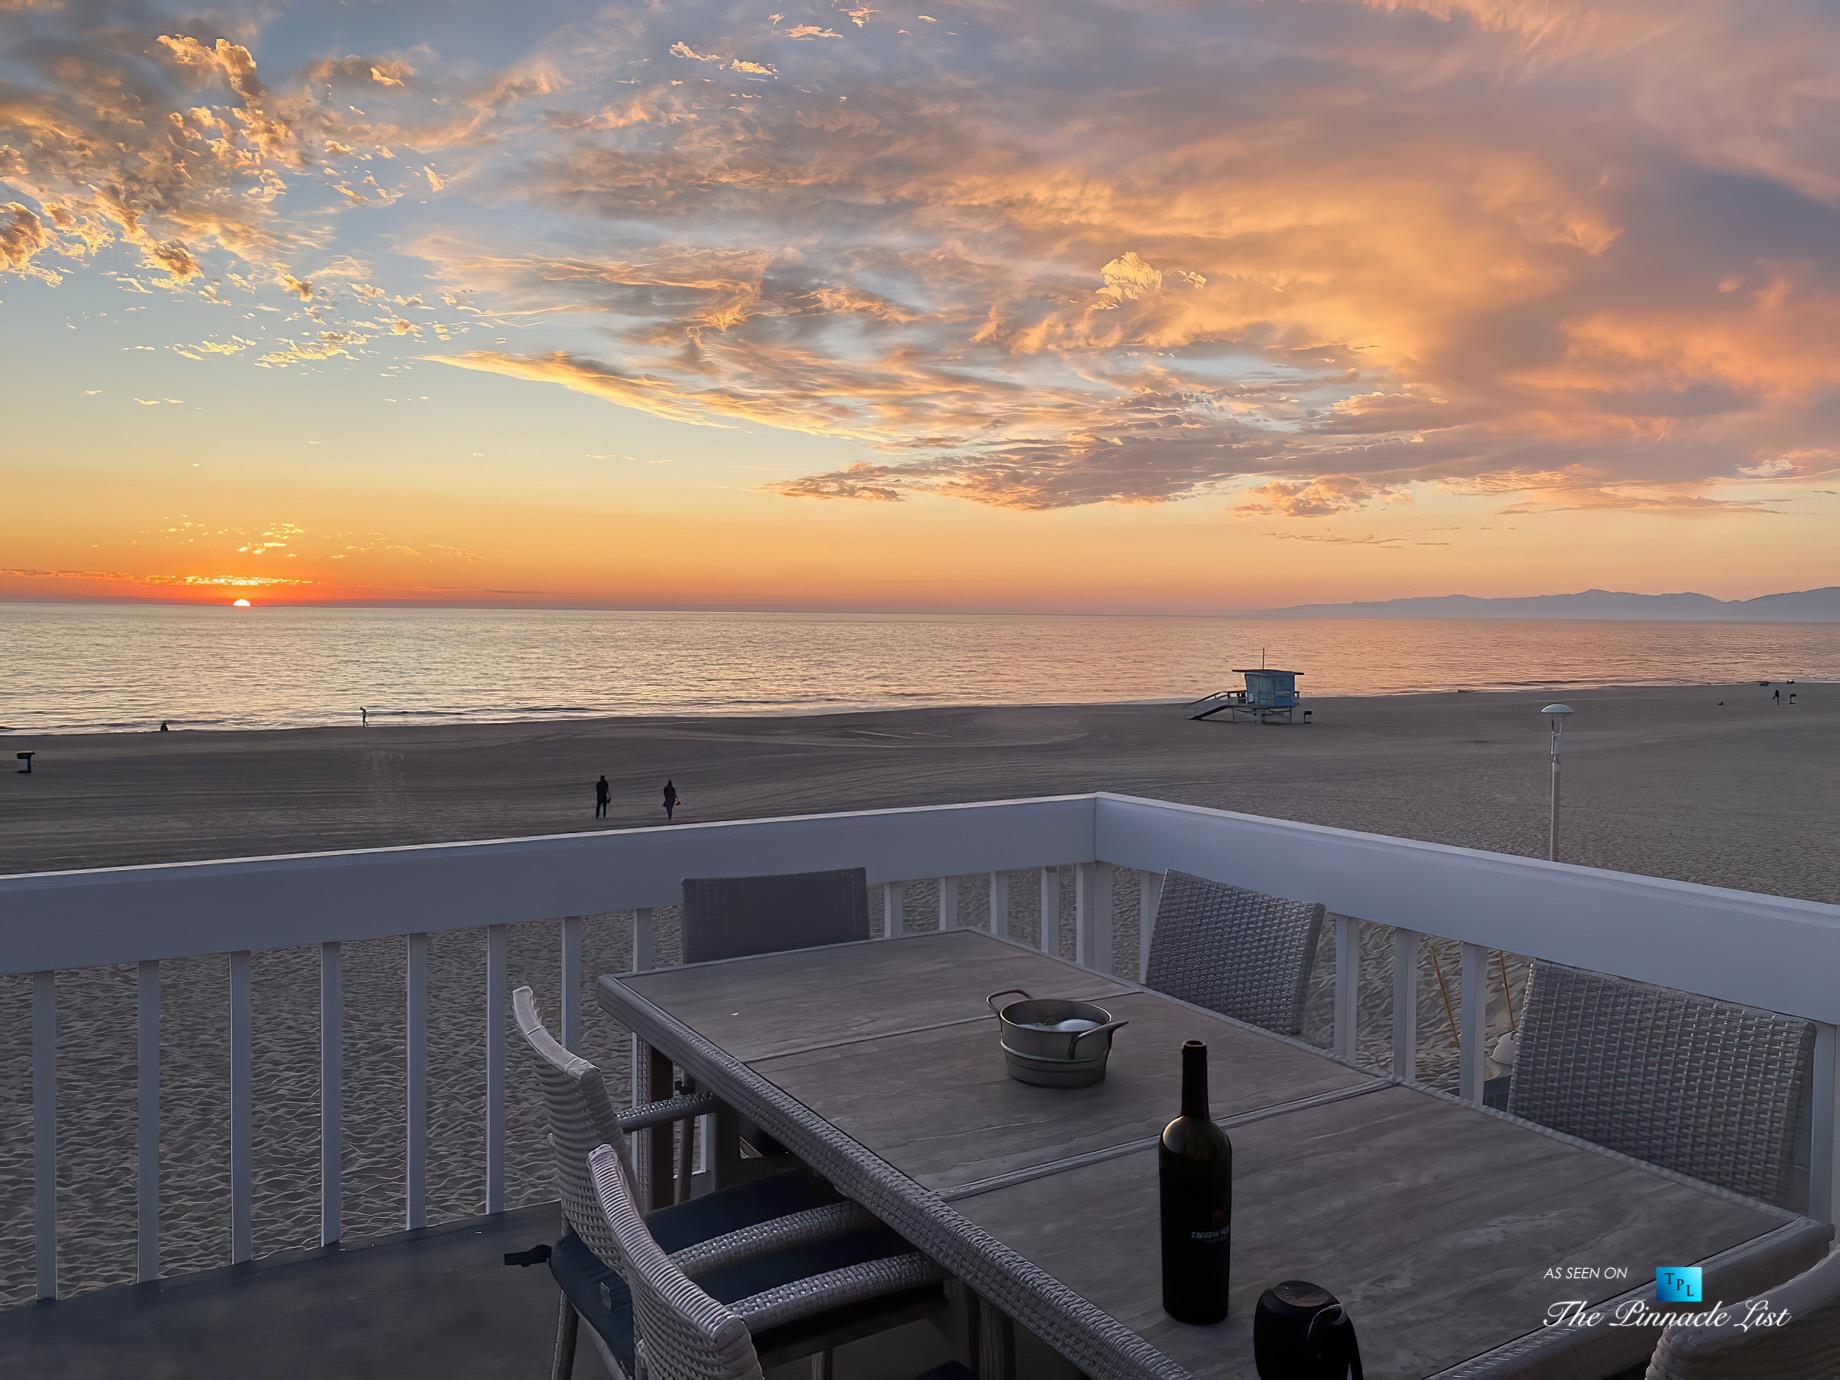 3500 The Strand, Hermosa Beach, CA, USA – Sunset Deck Beach View – Luxury Real Estate – Original 90210 Beach House